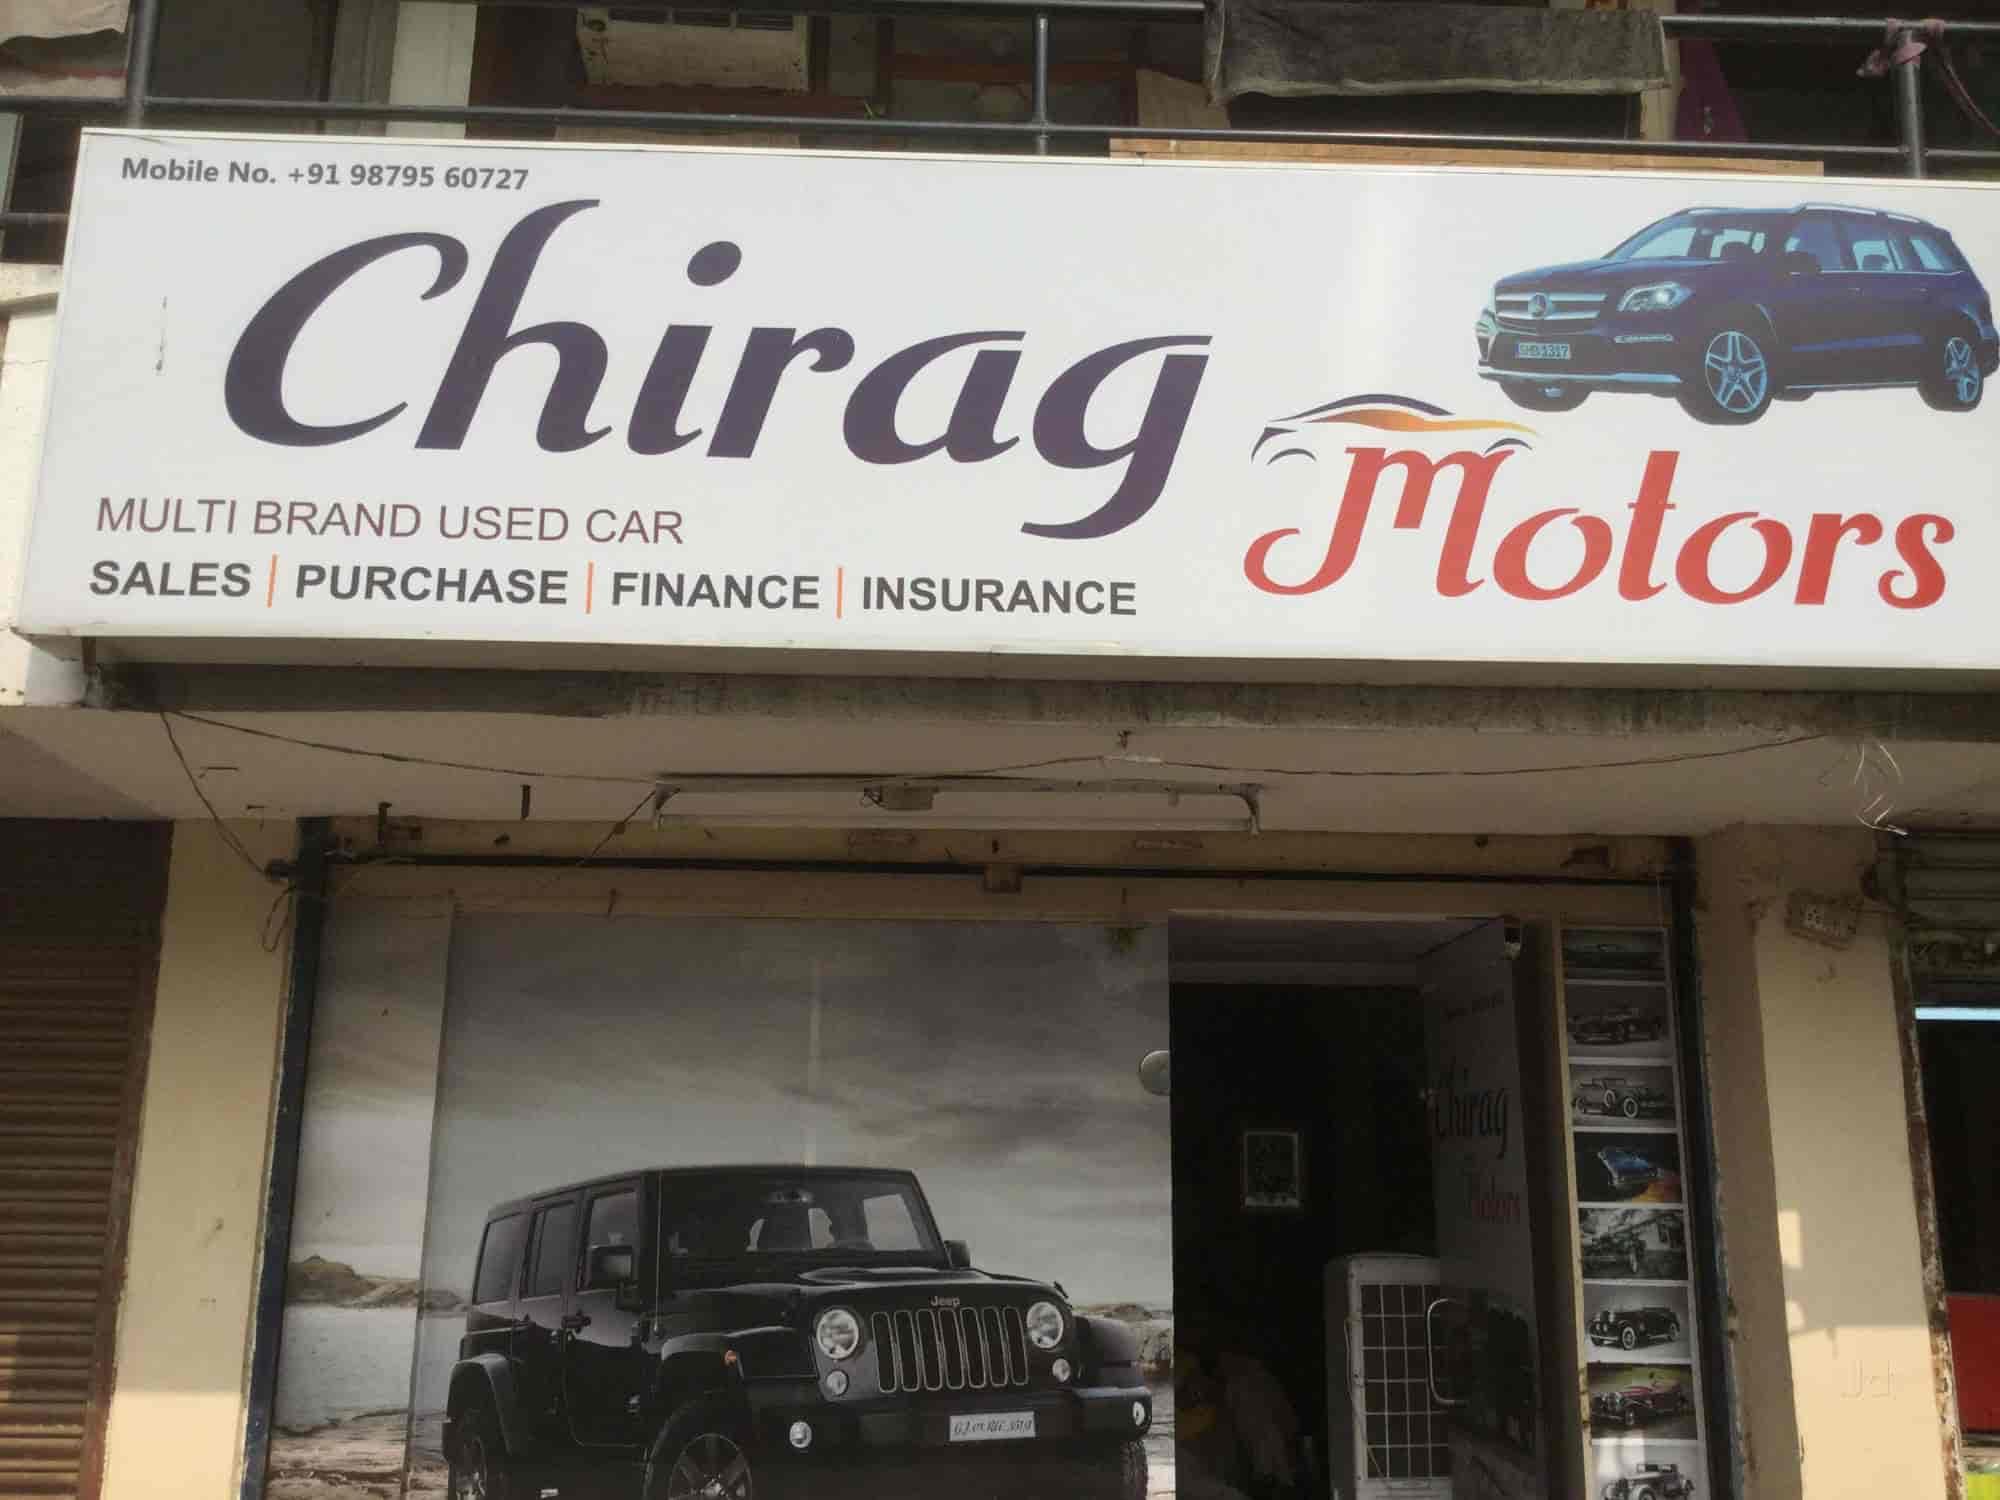 Chirag Motors, Naranpura Vistar - Second Hand Car Dealers in Ahmedabad - Justdial